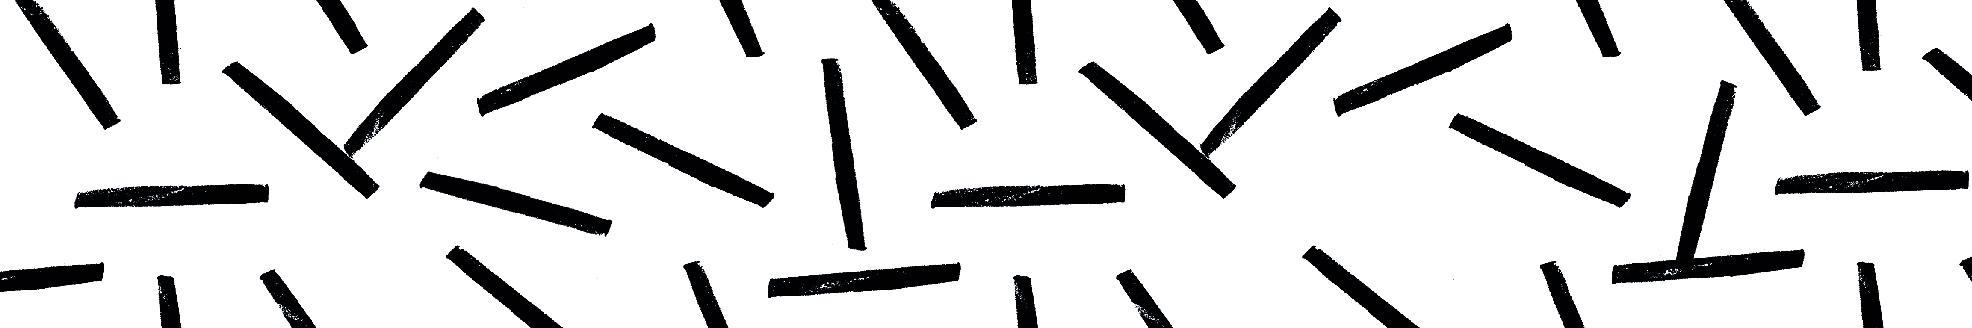 Pattern_v4.jpg